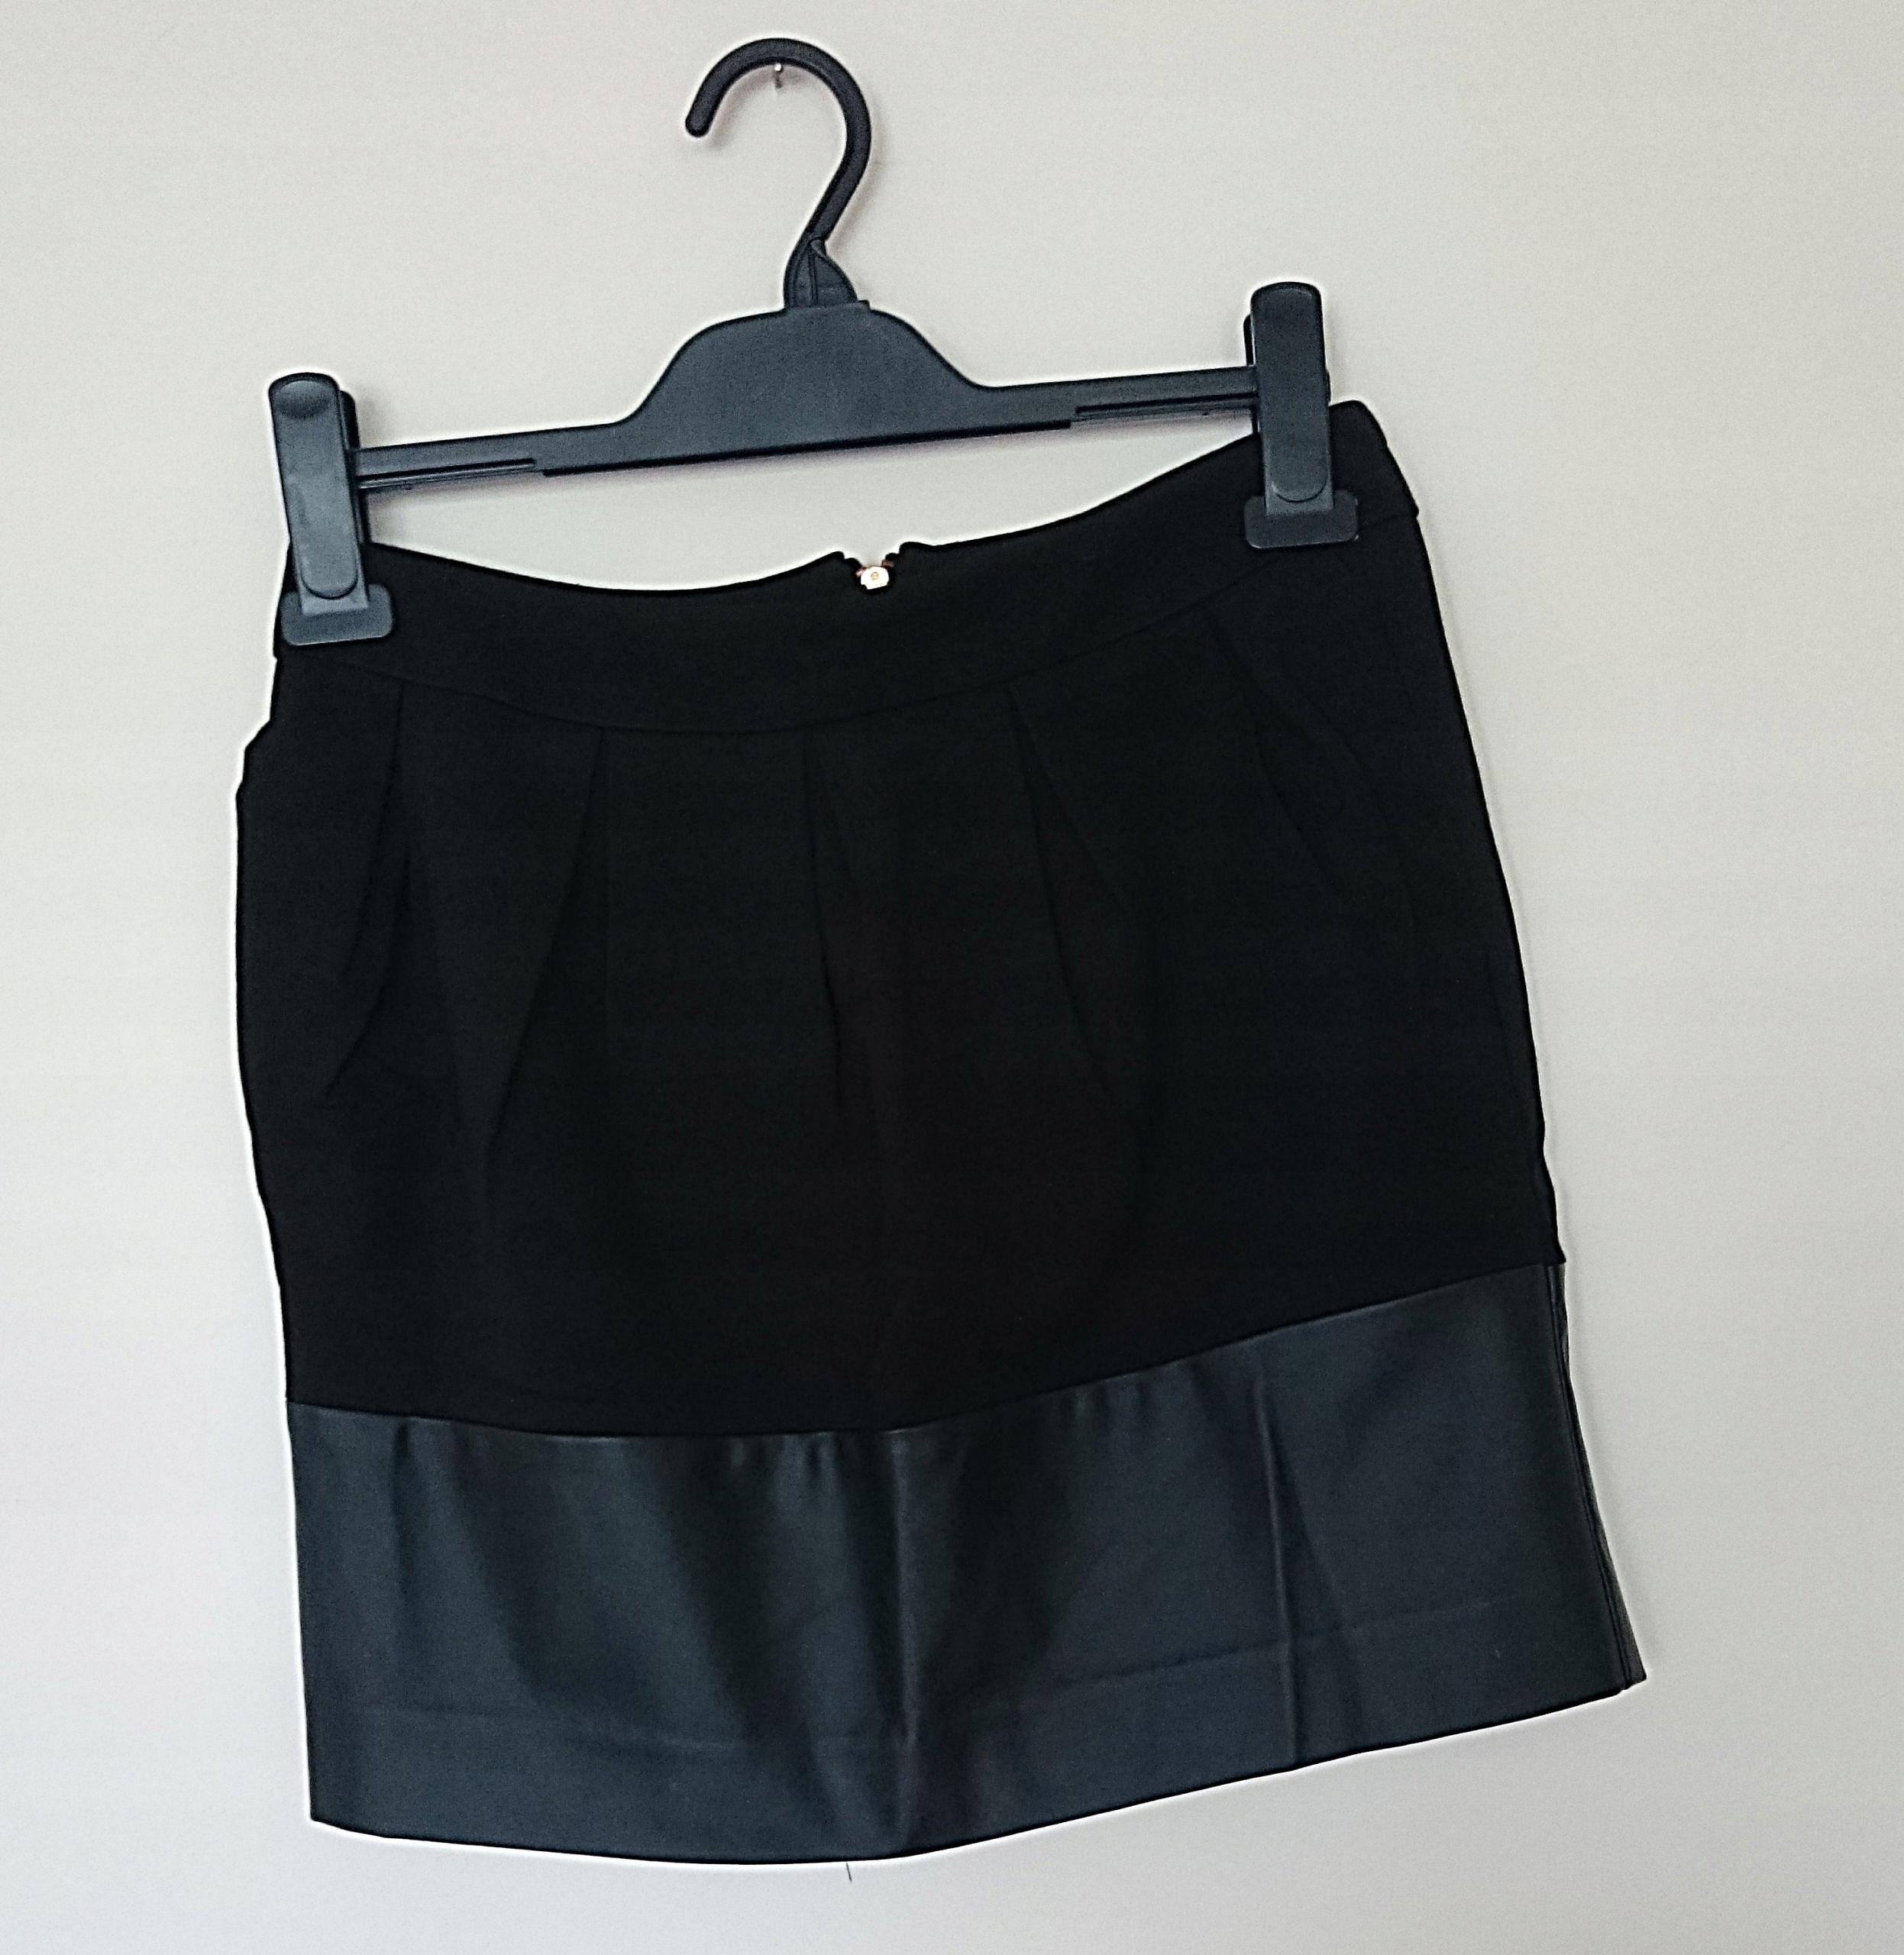 ee0266ac Reserved czarna elegancka spódnica eko skórka